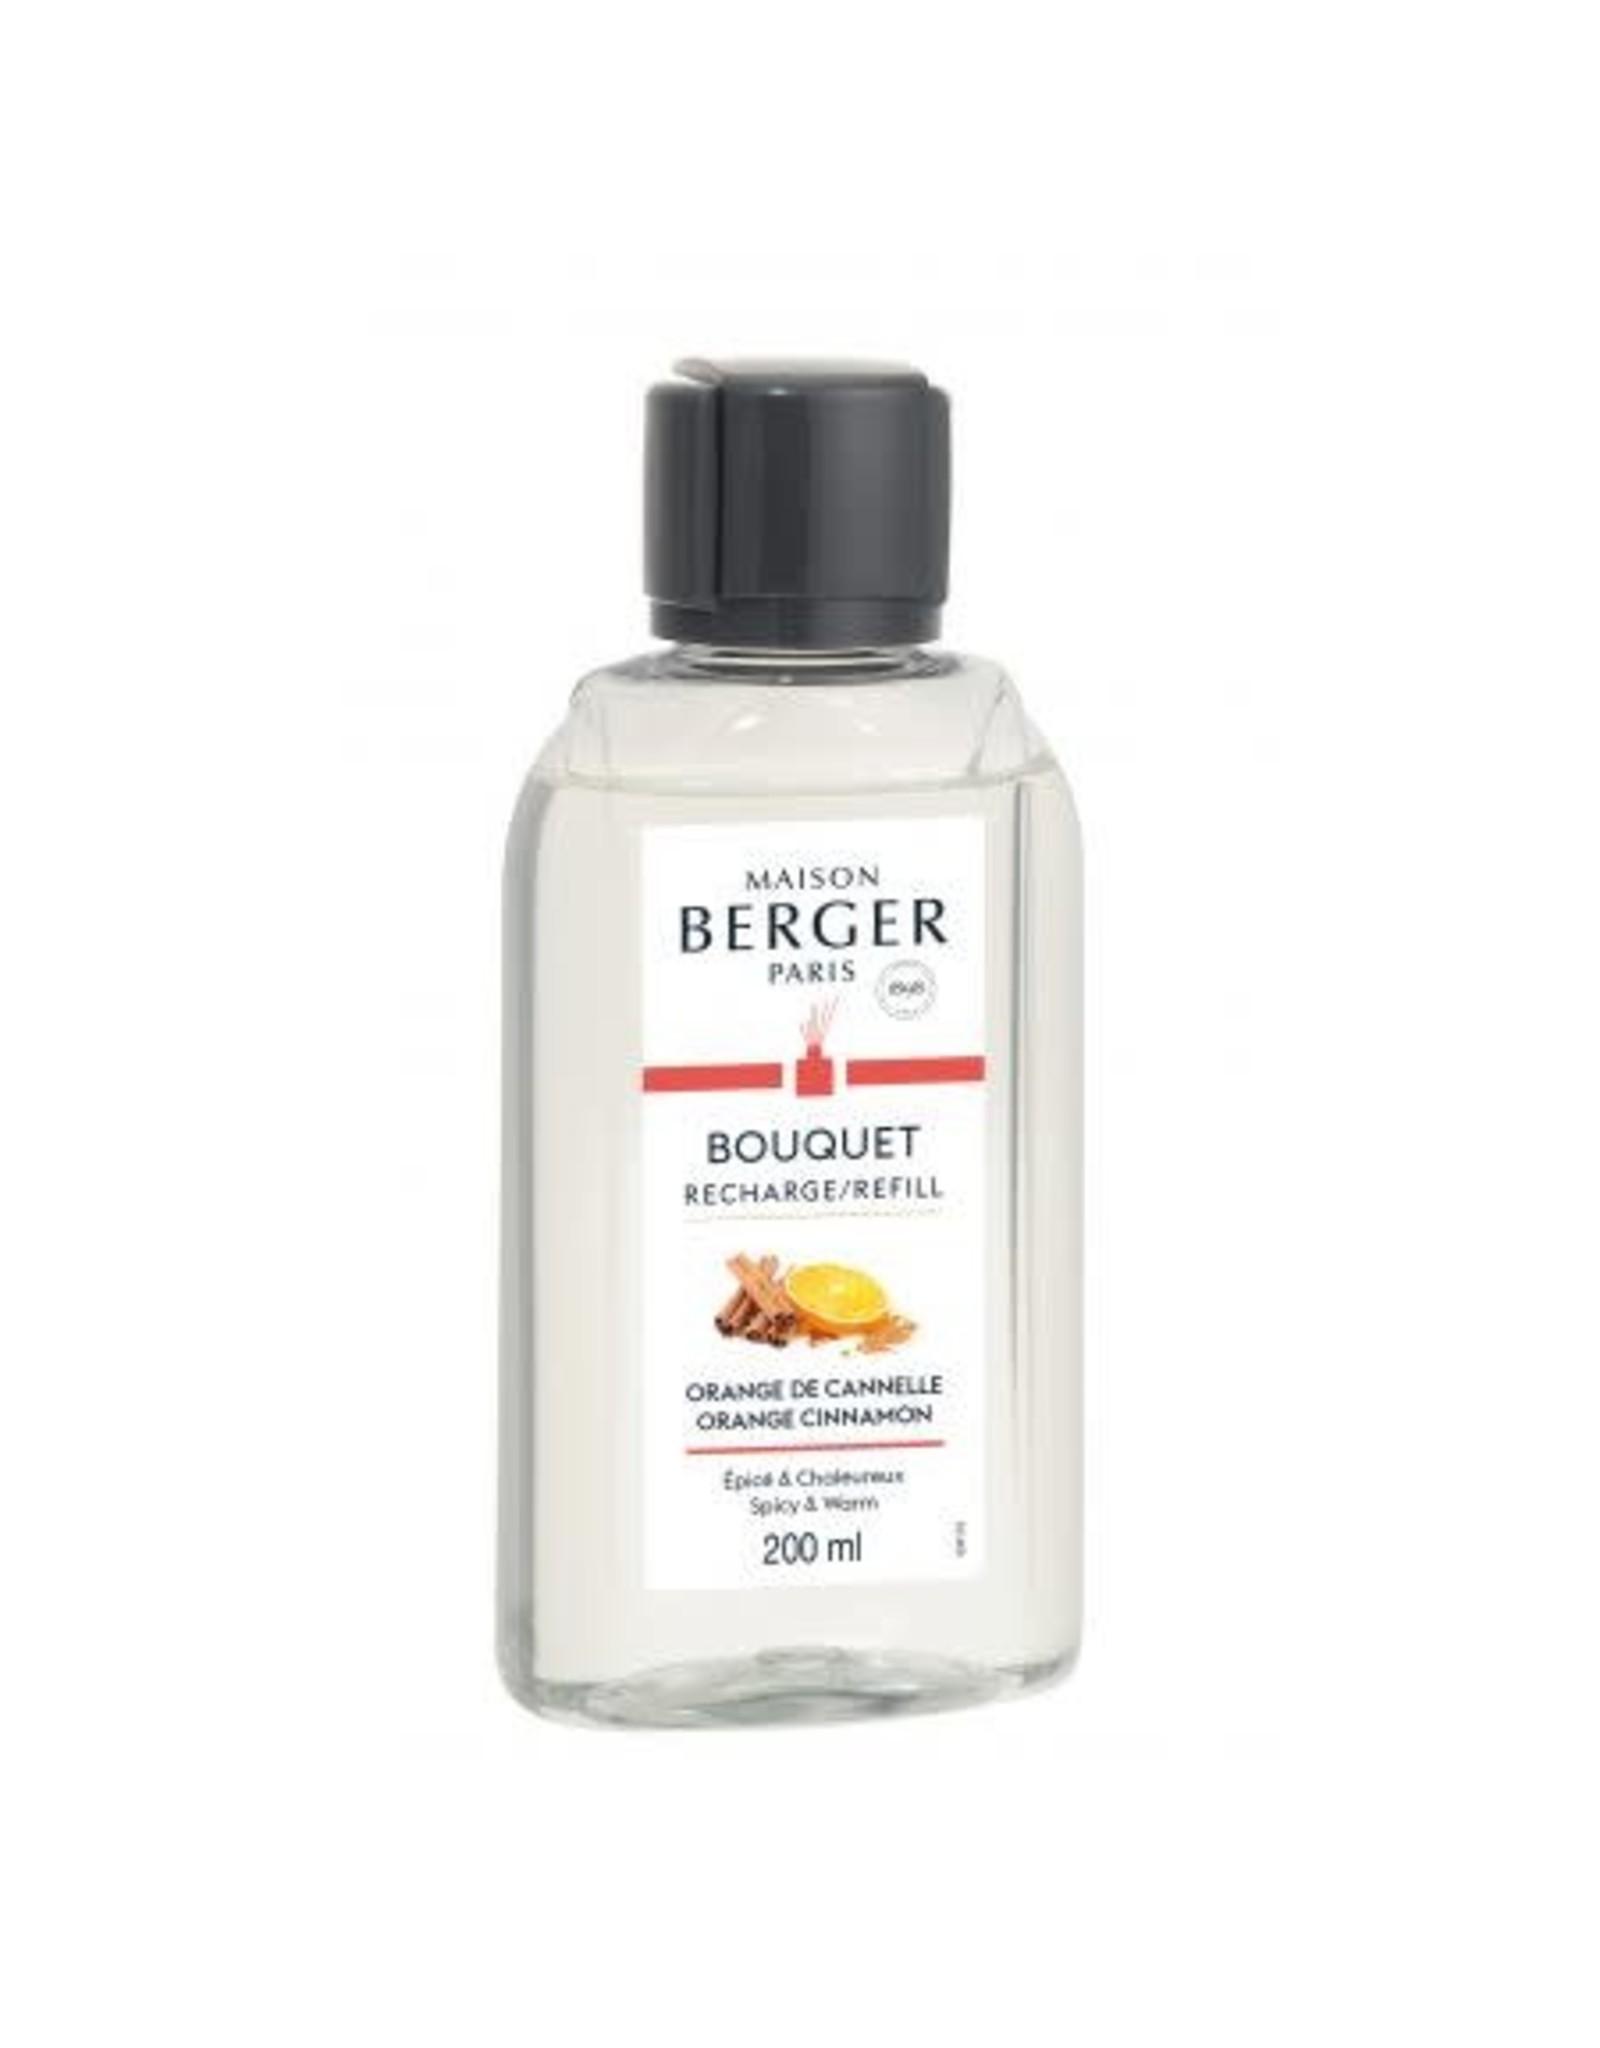 Maison Berger Maison Berger.  Navulling parfumverspreider met sticks 200ml Orange de Cannelle